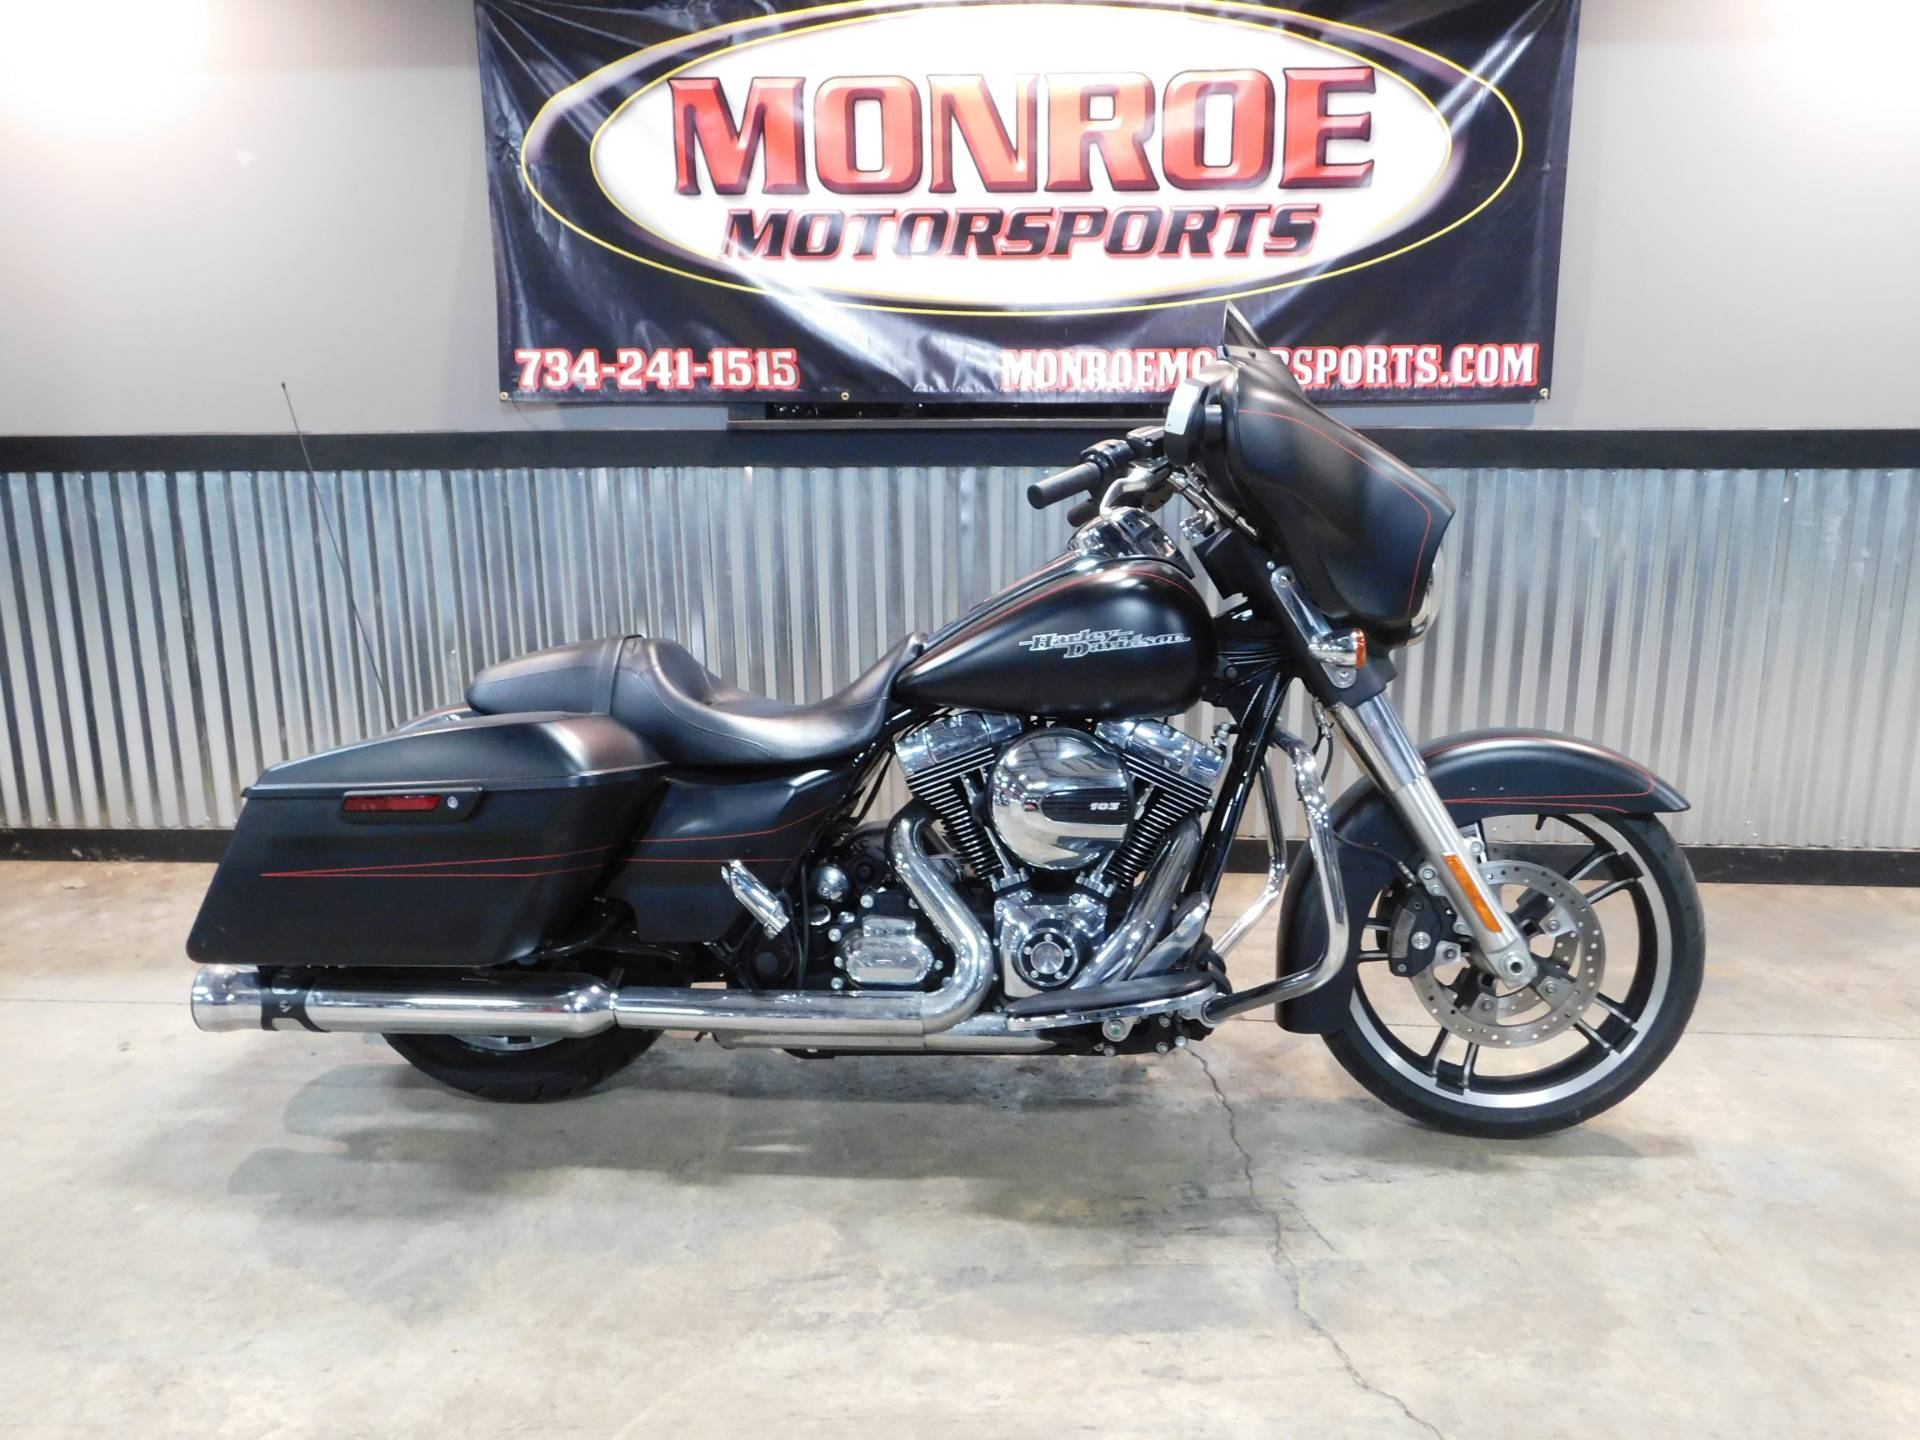 2015 Harley-Davidson Street Glide® Special in Monroe, Michigan